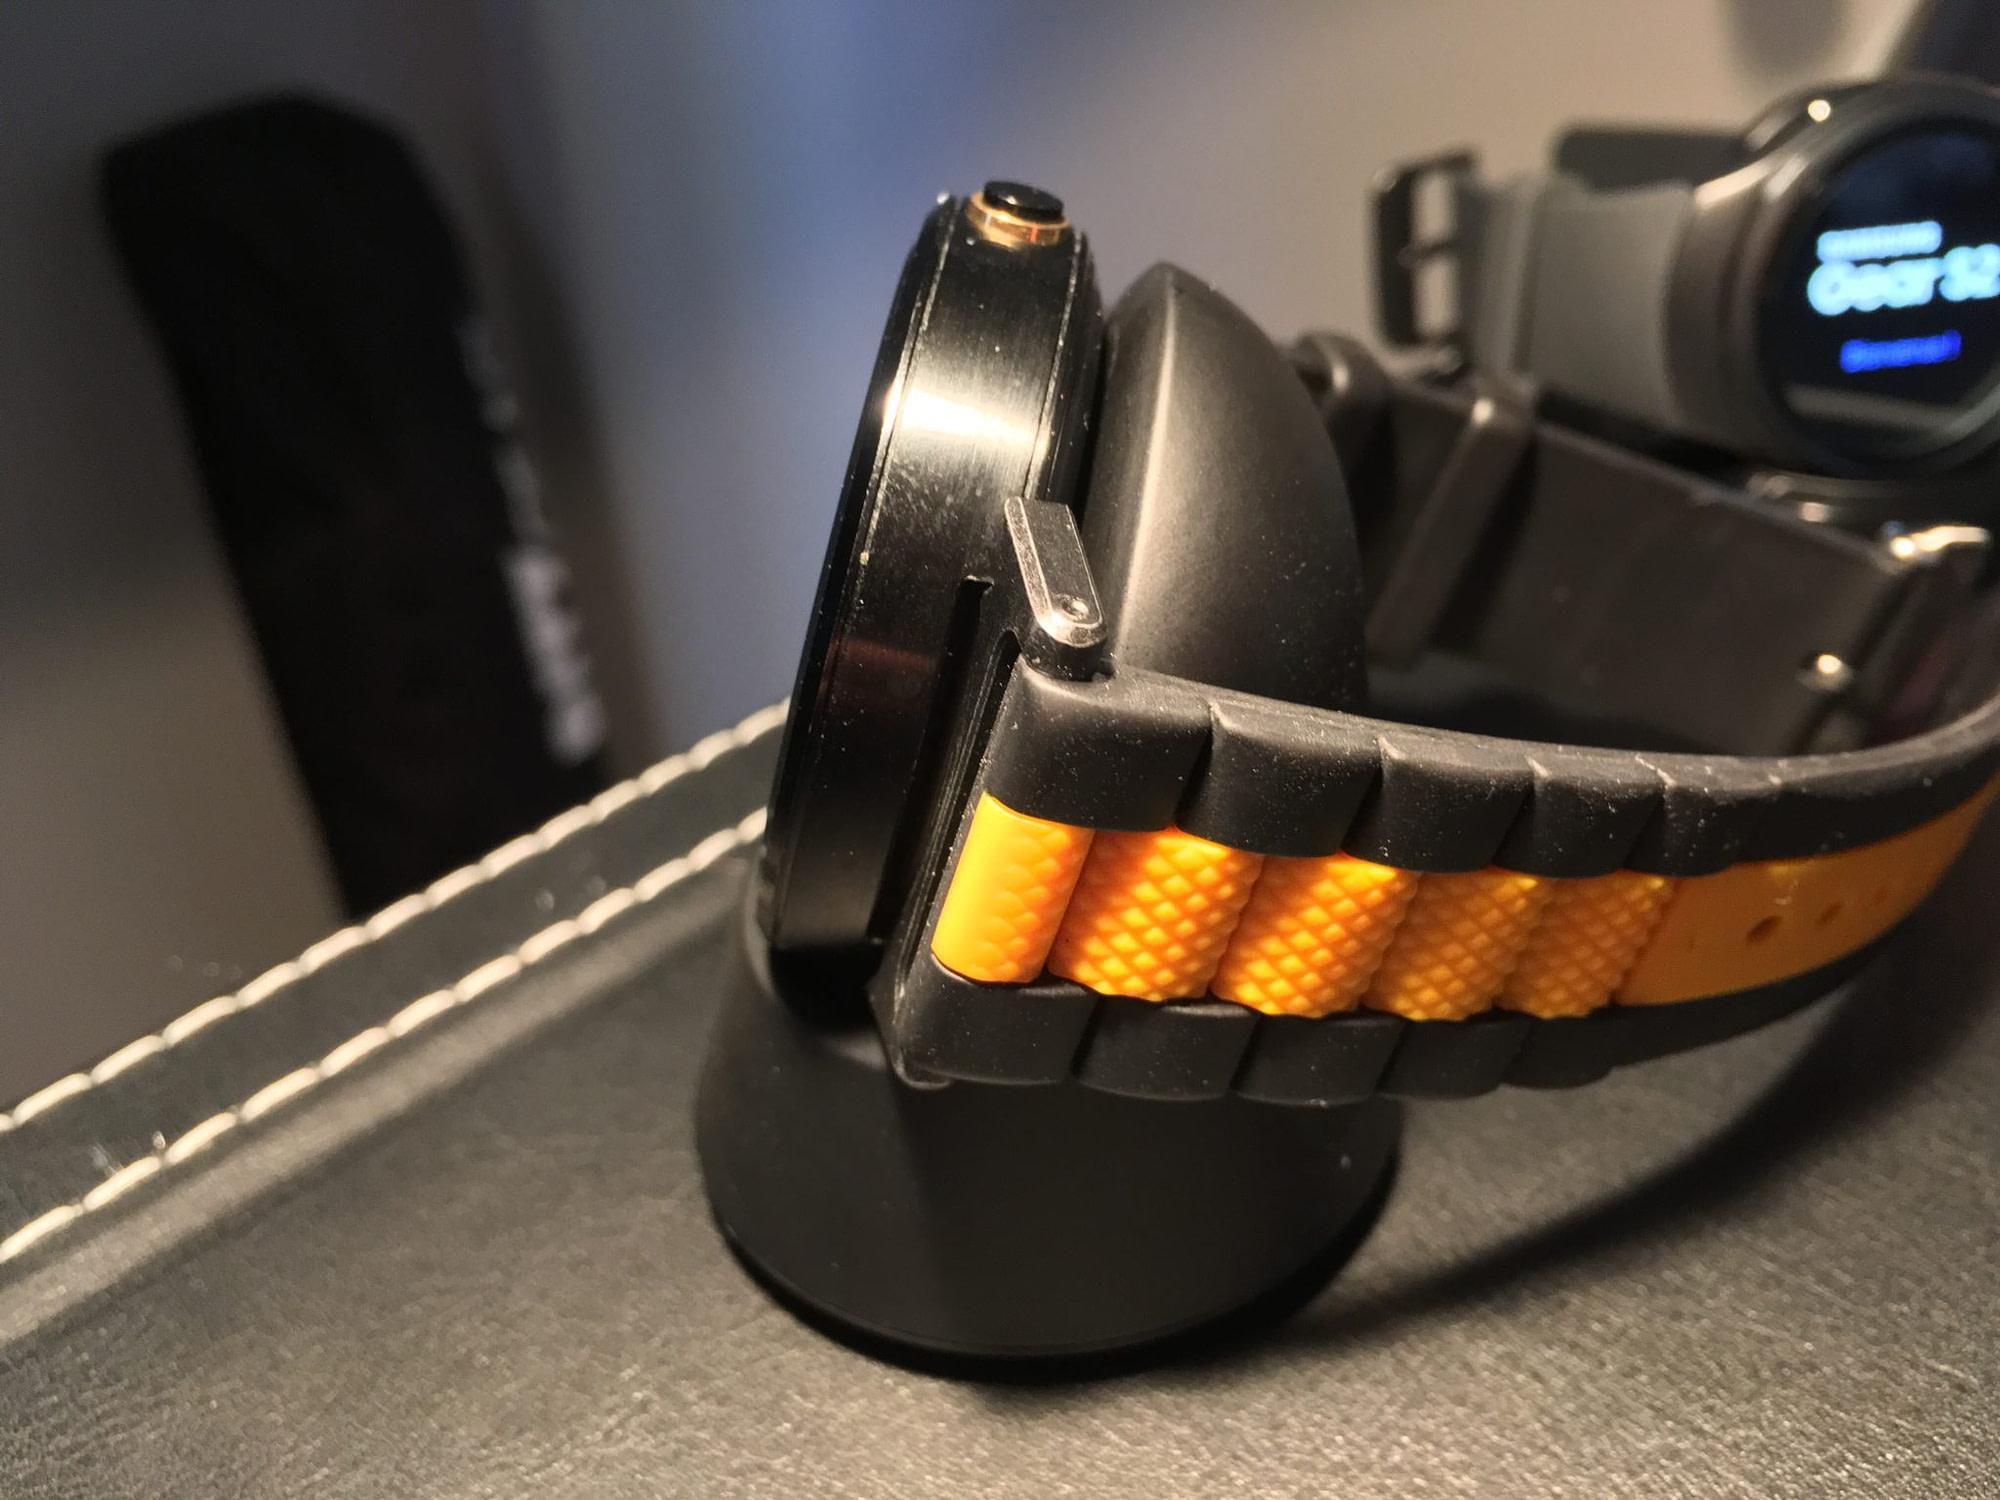 Moto 360 charging